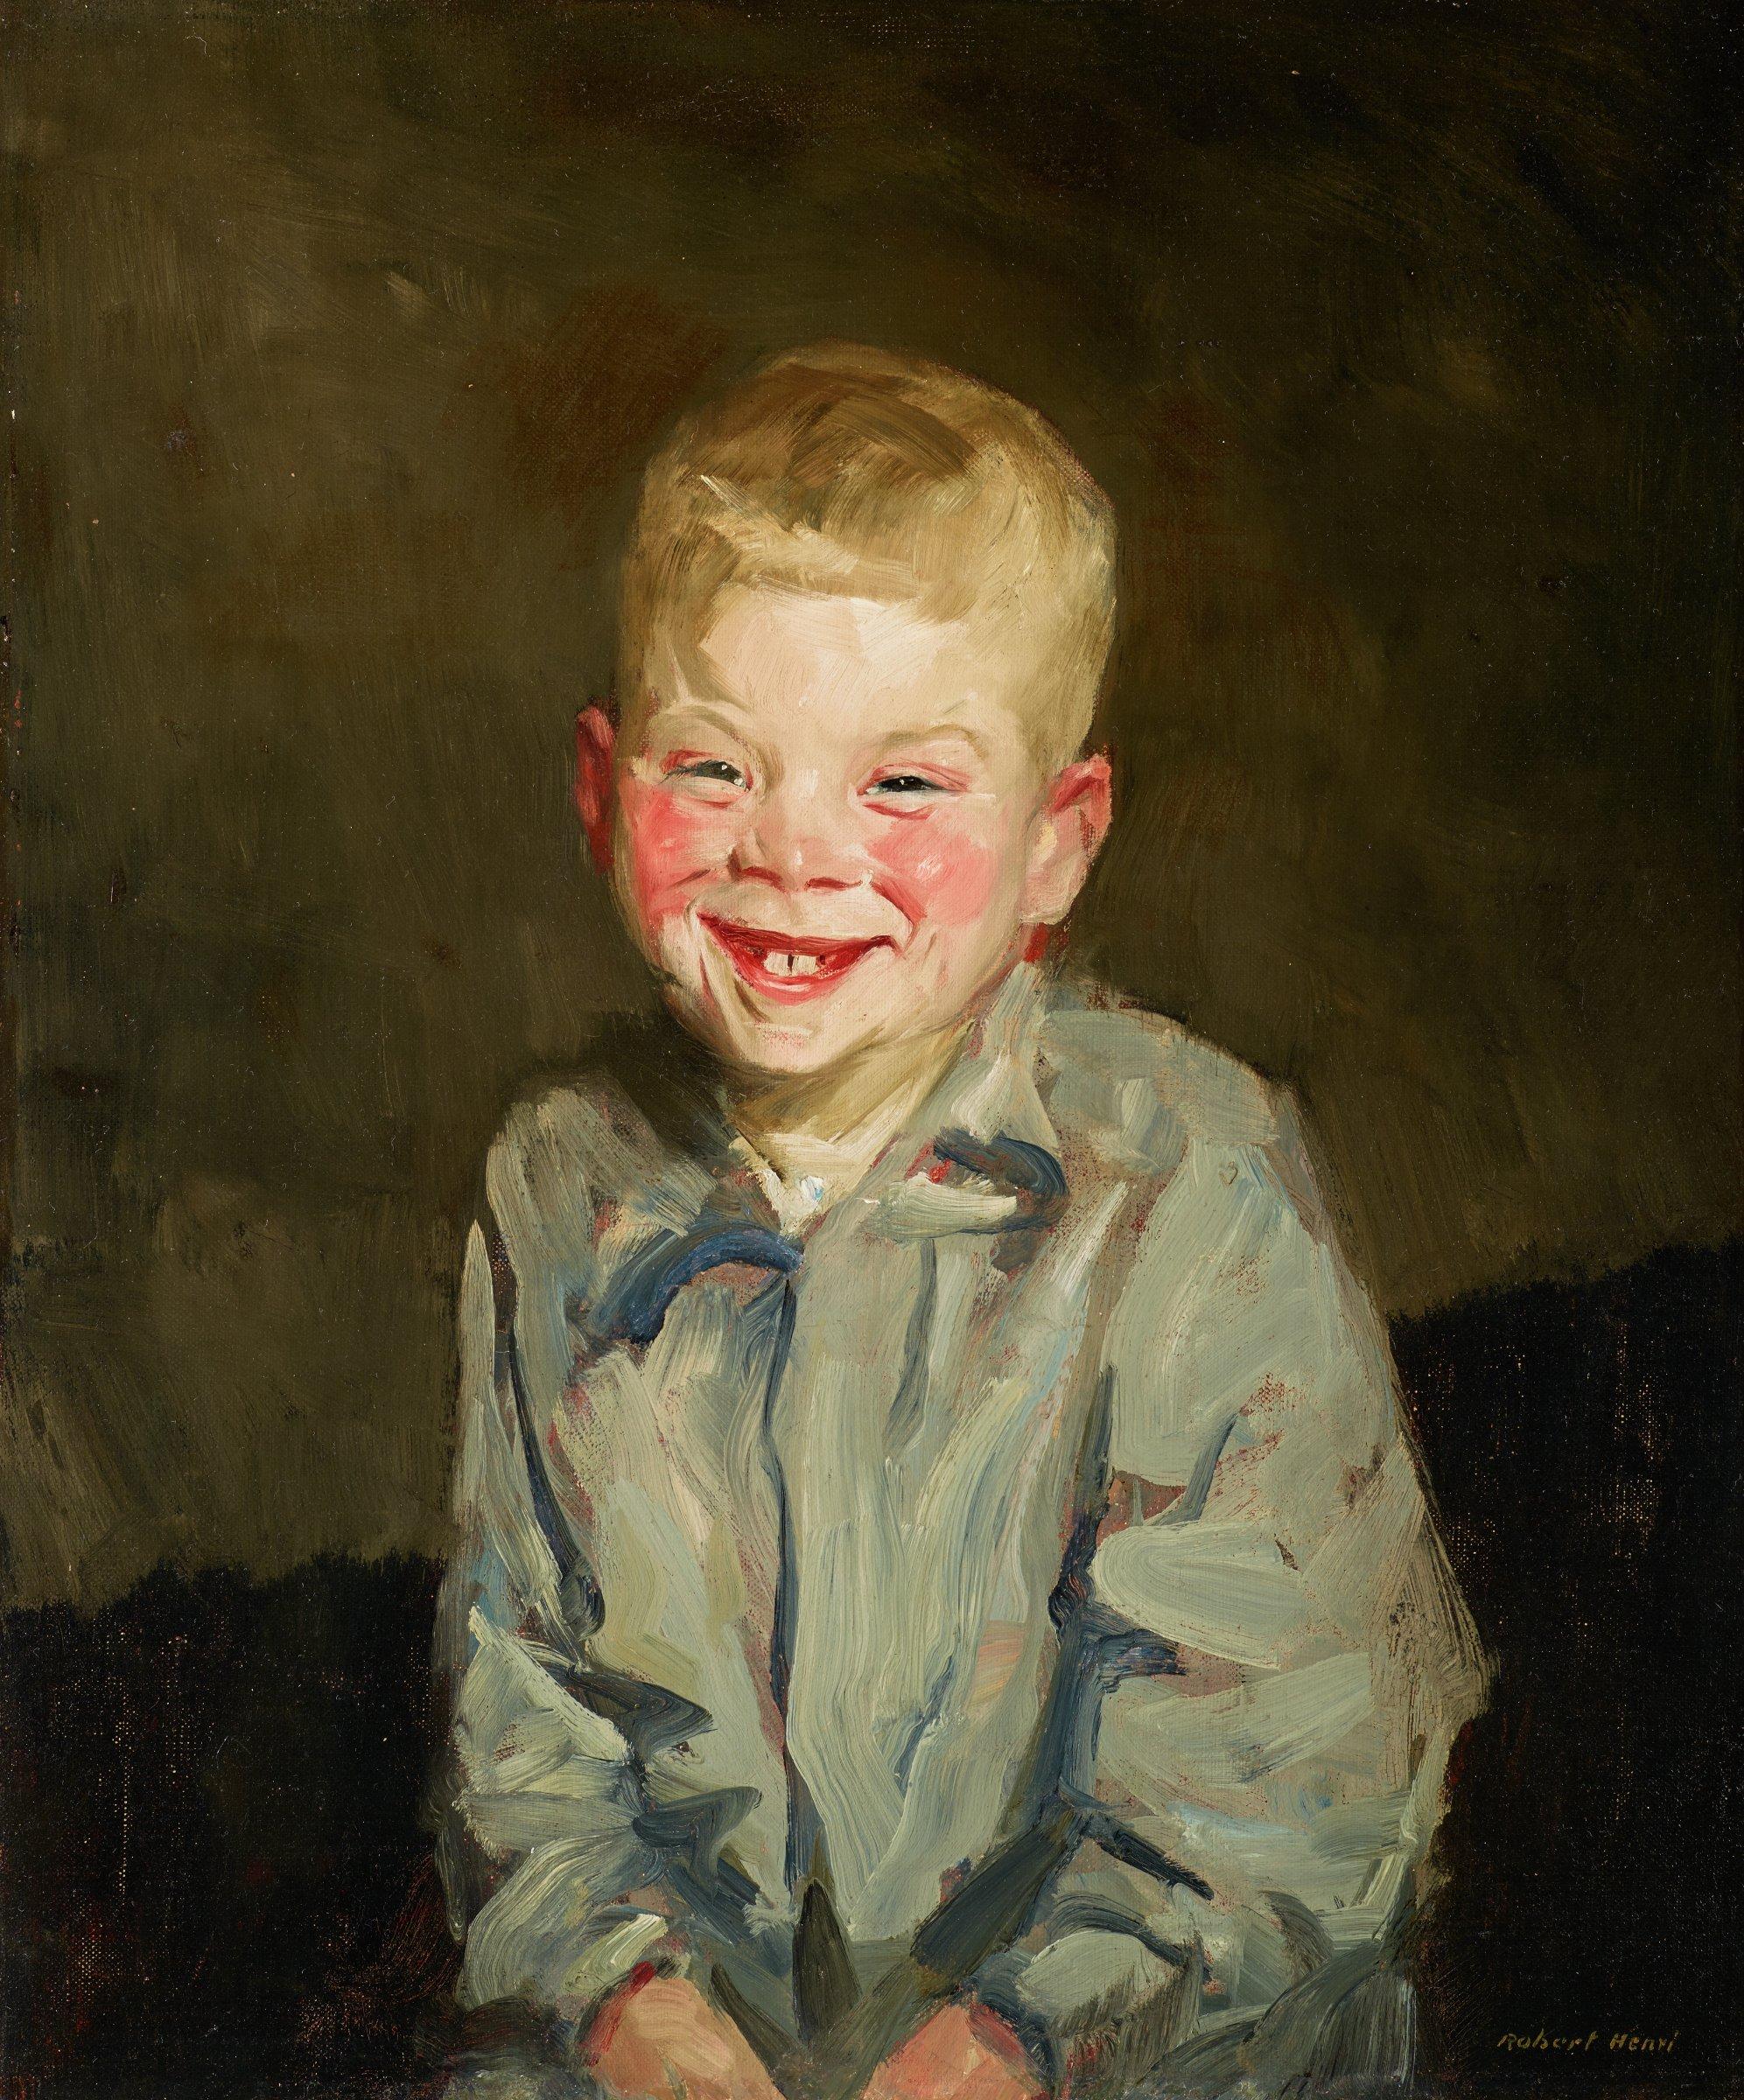 The Laughing Boy (Jopie van Slouten), Robert Henri, oil on canvas